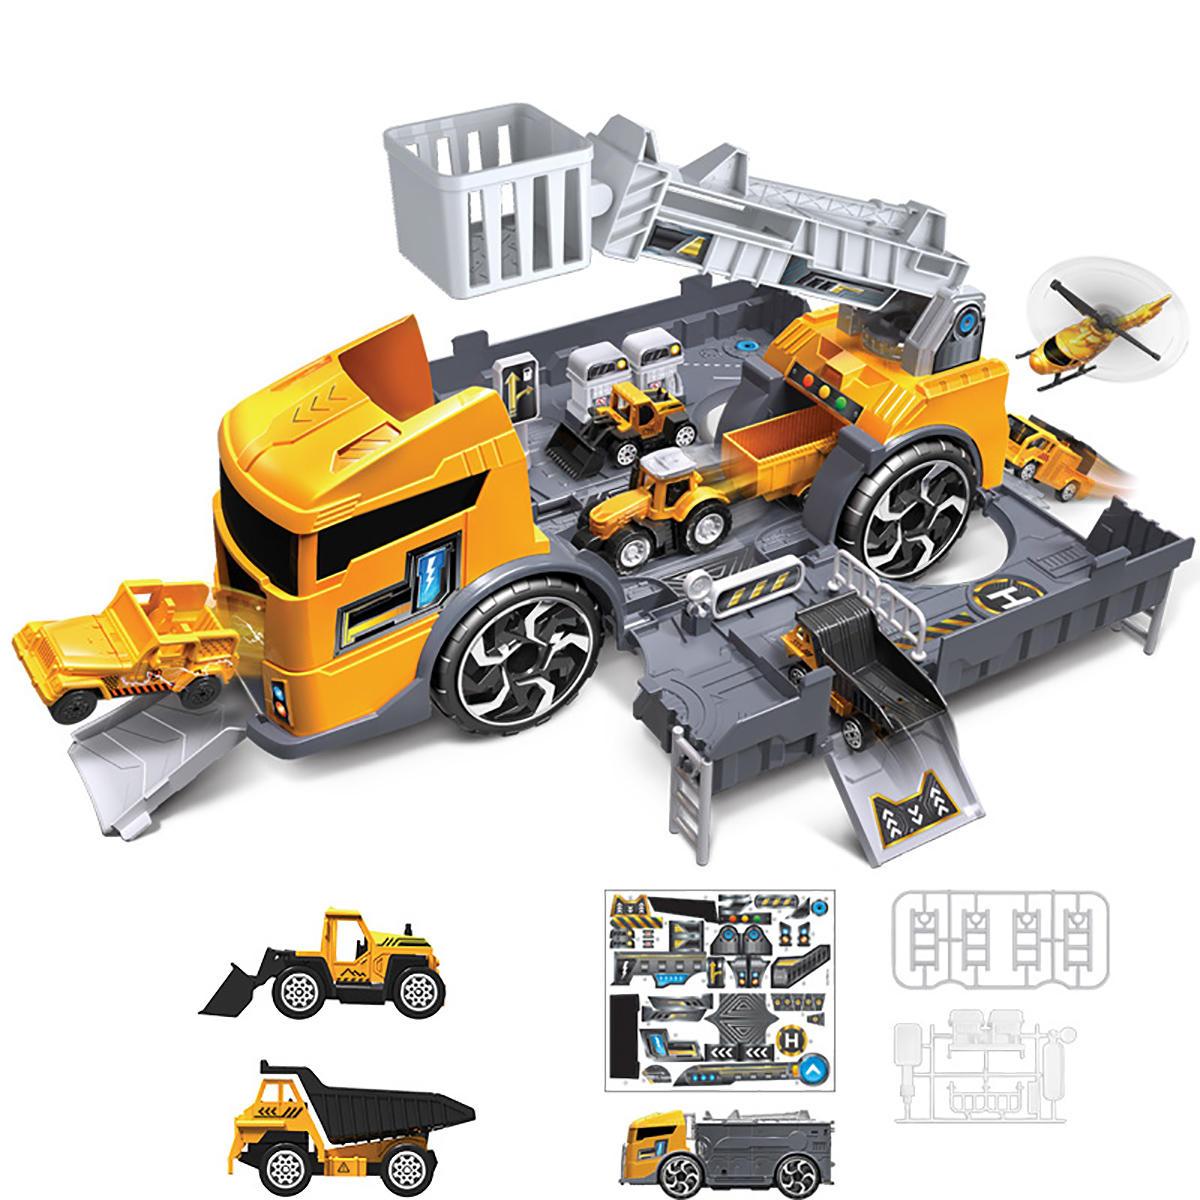 Children's Simulation Diecast Engineering Vehicle Model Set Deformation Storage Parking Lot Educational Toys